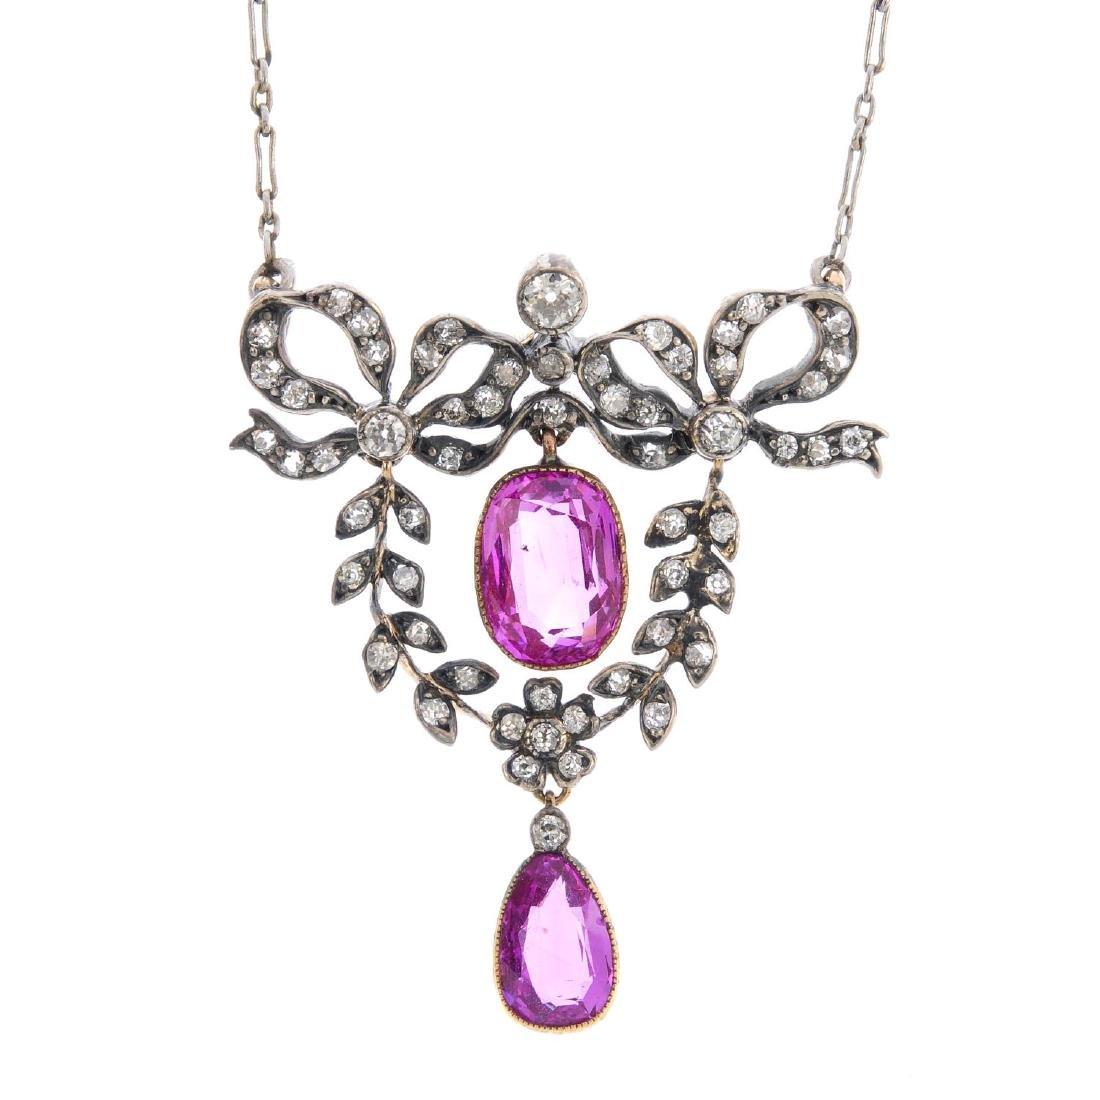 An early 20th century Burmese sapphire and diamond